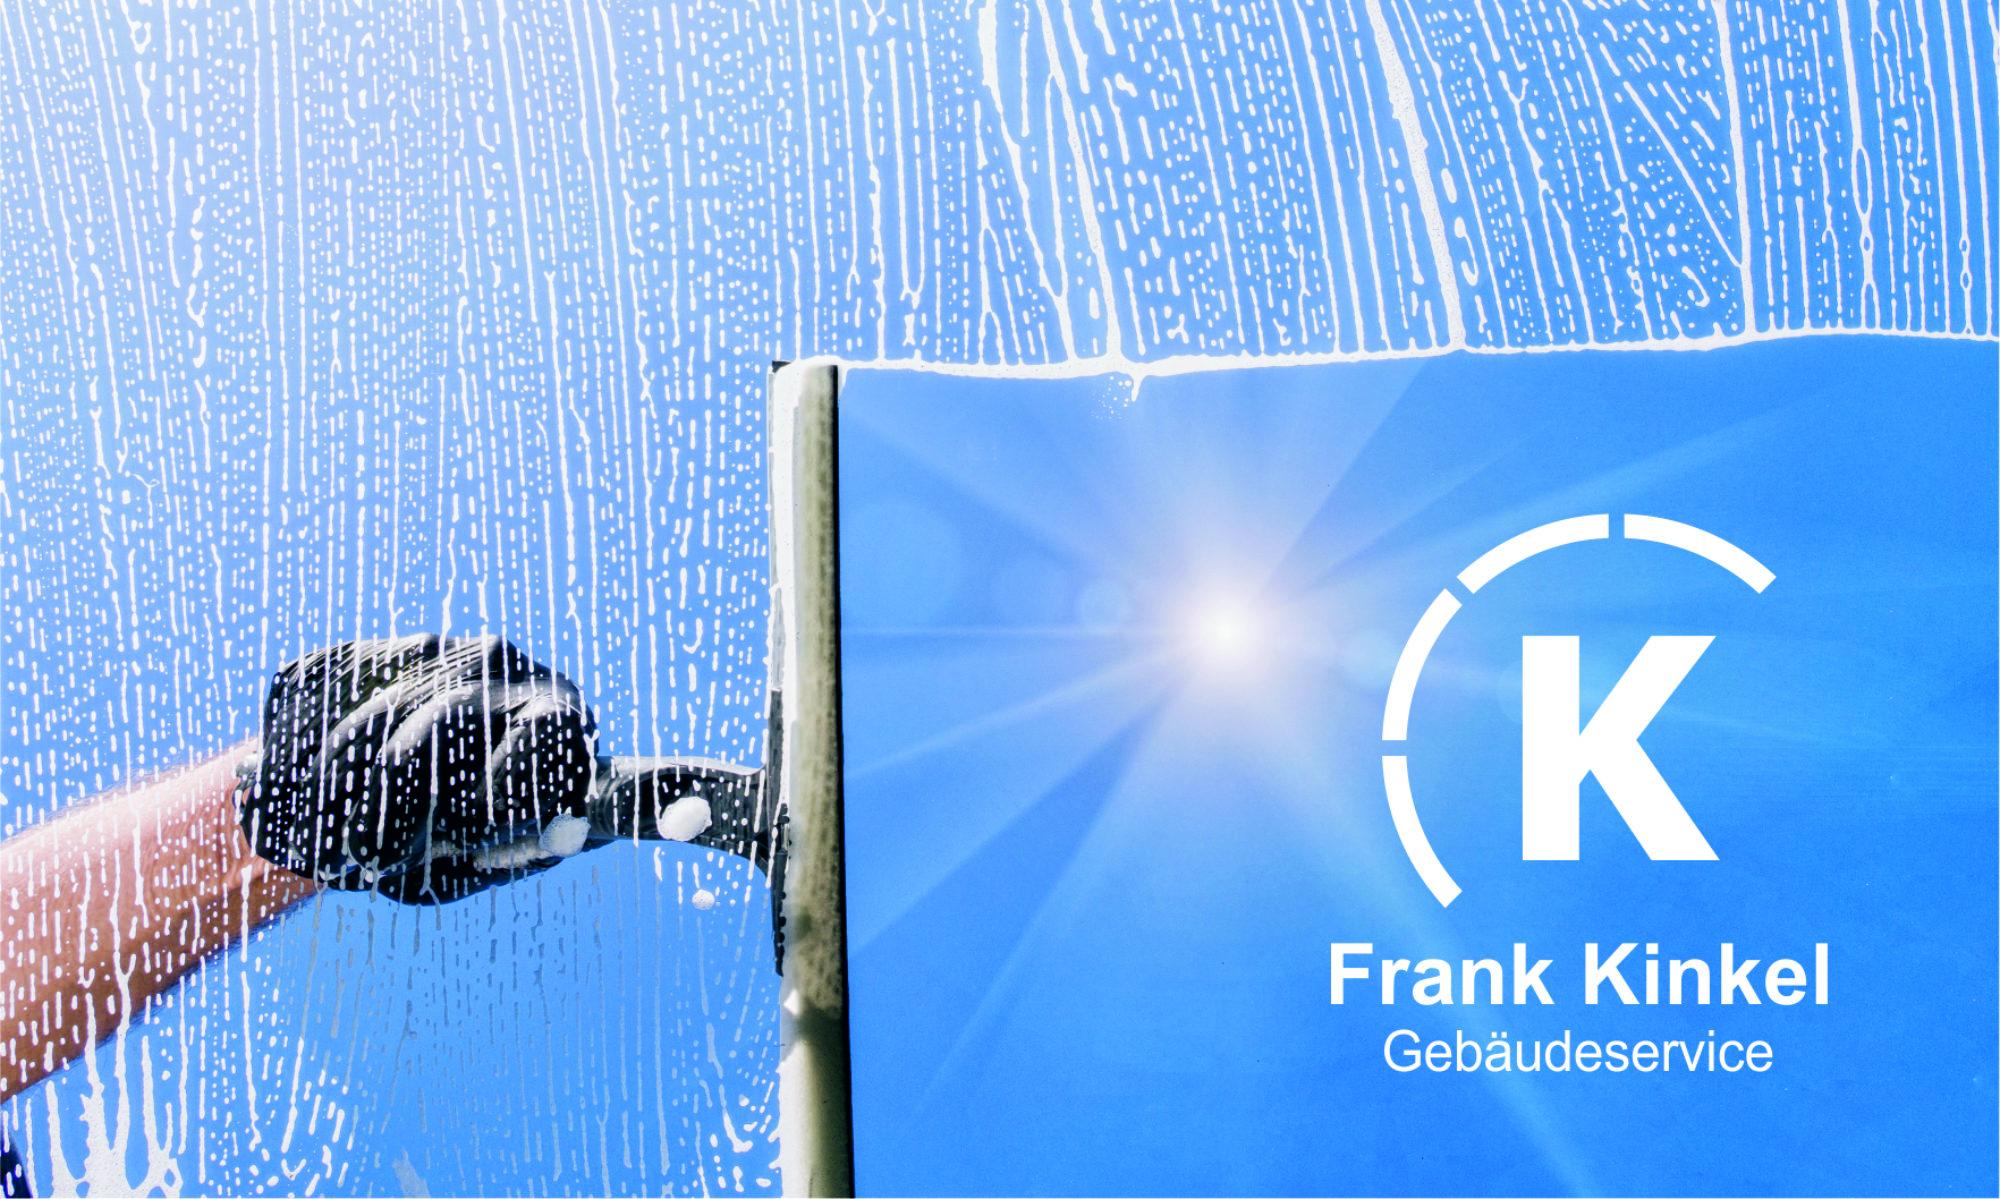 Frank Kinkel